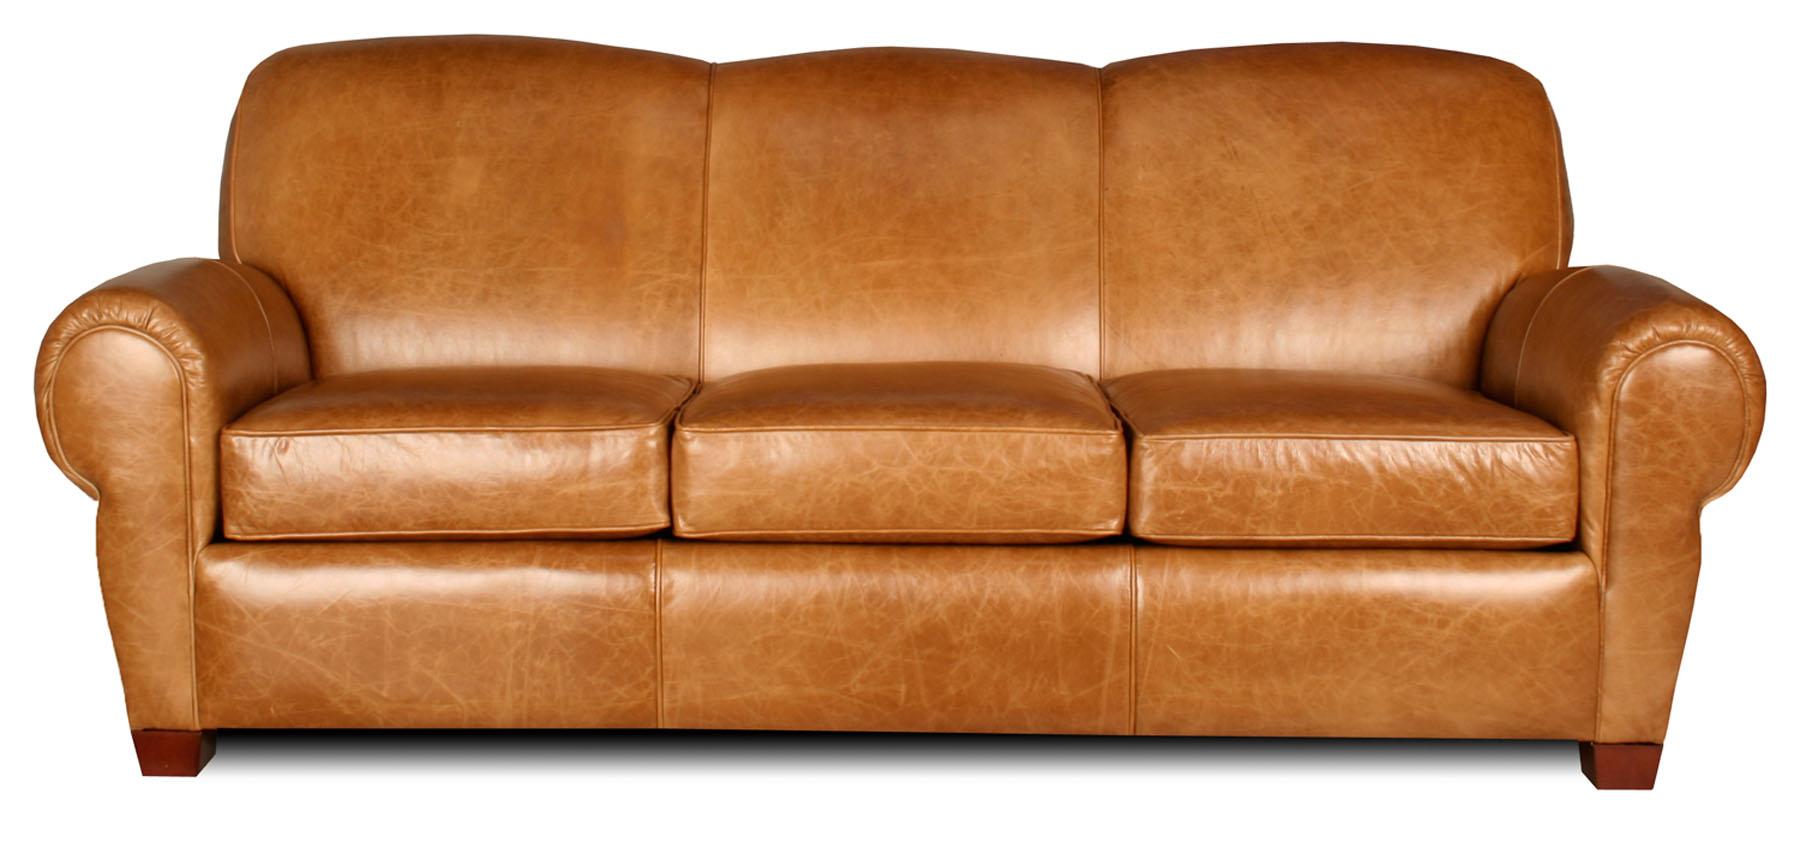 leather sofa atlanta ga latest corner design 2017 buckhead  furniture